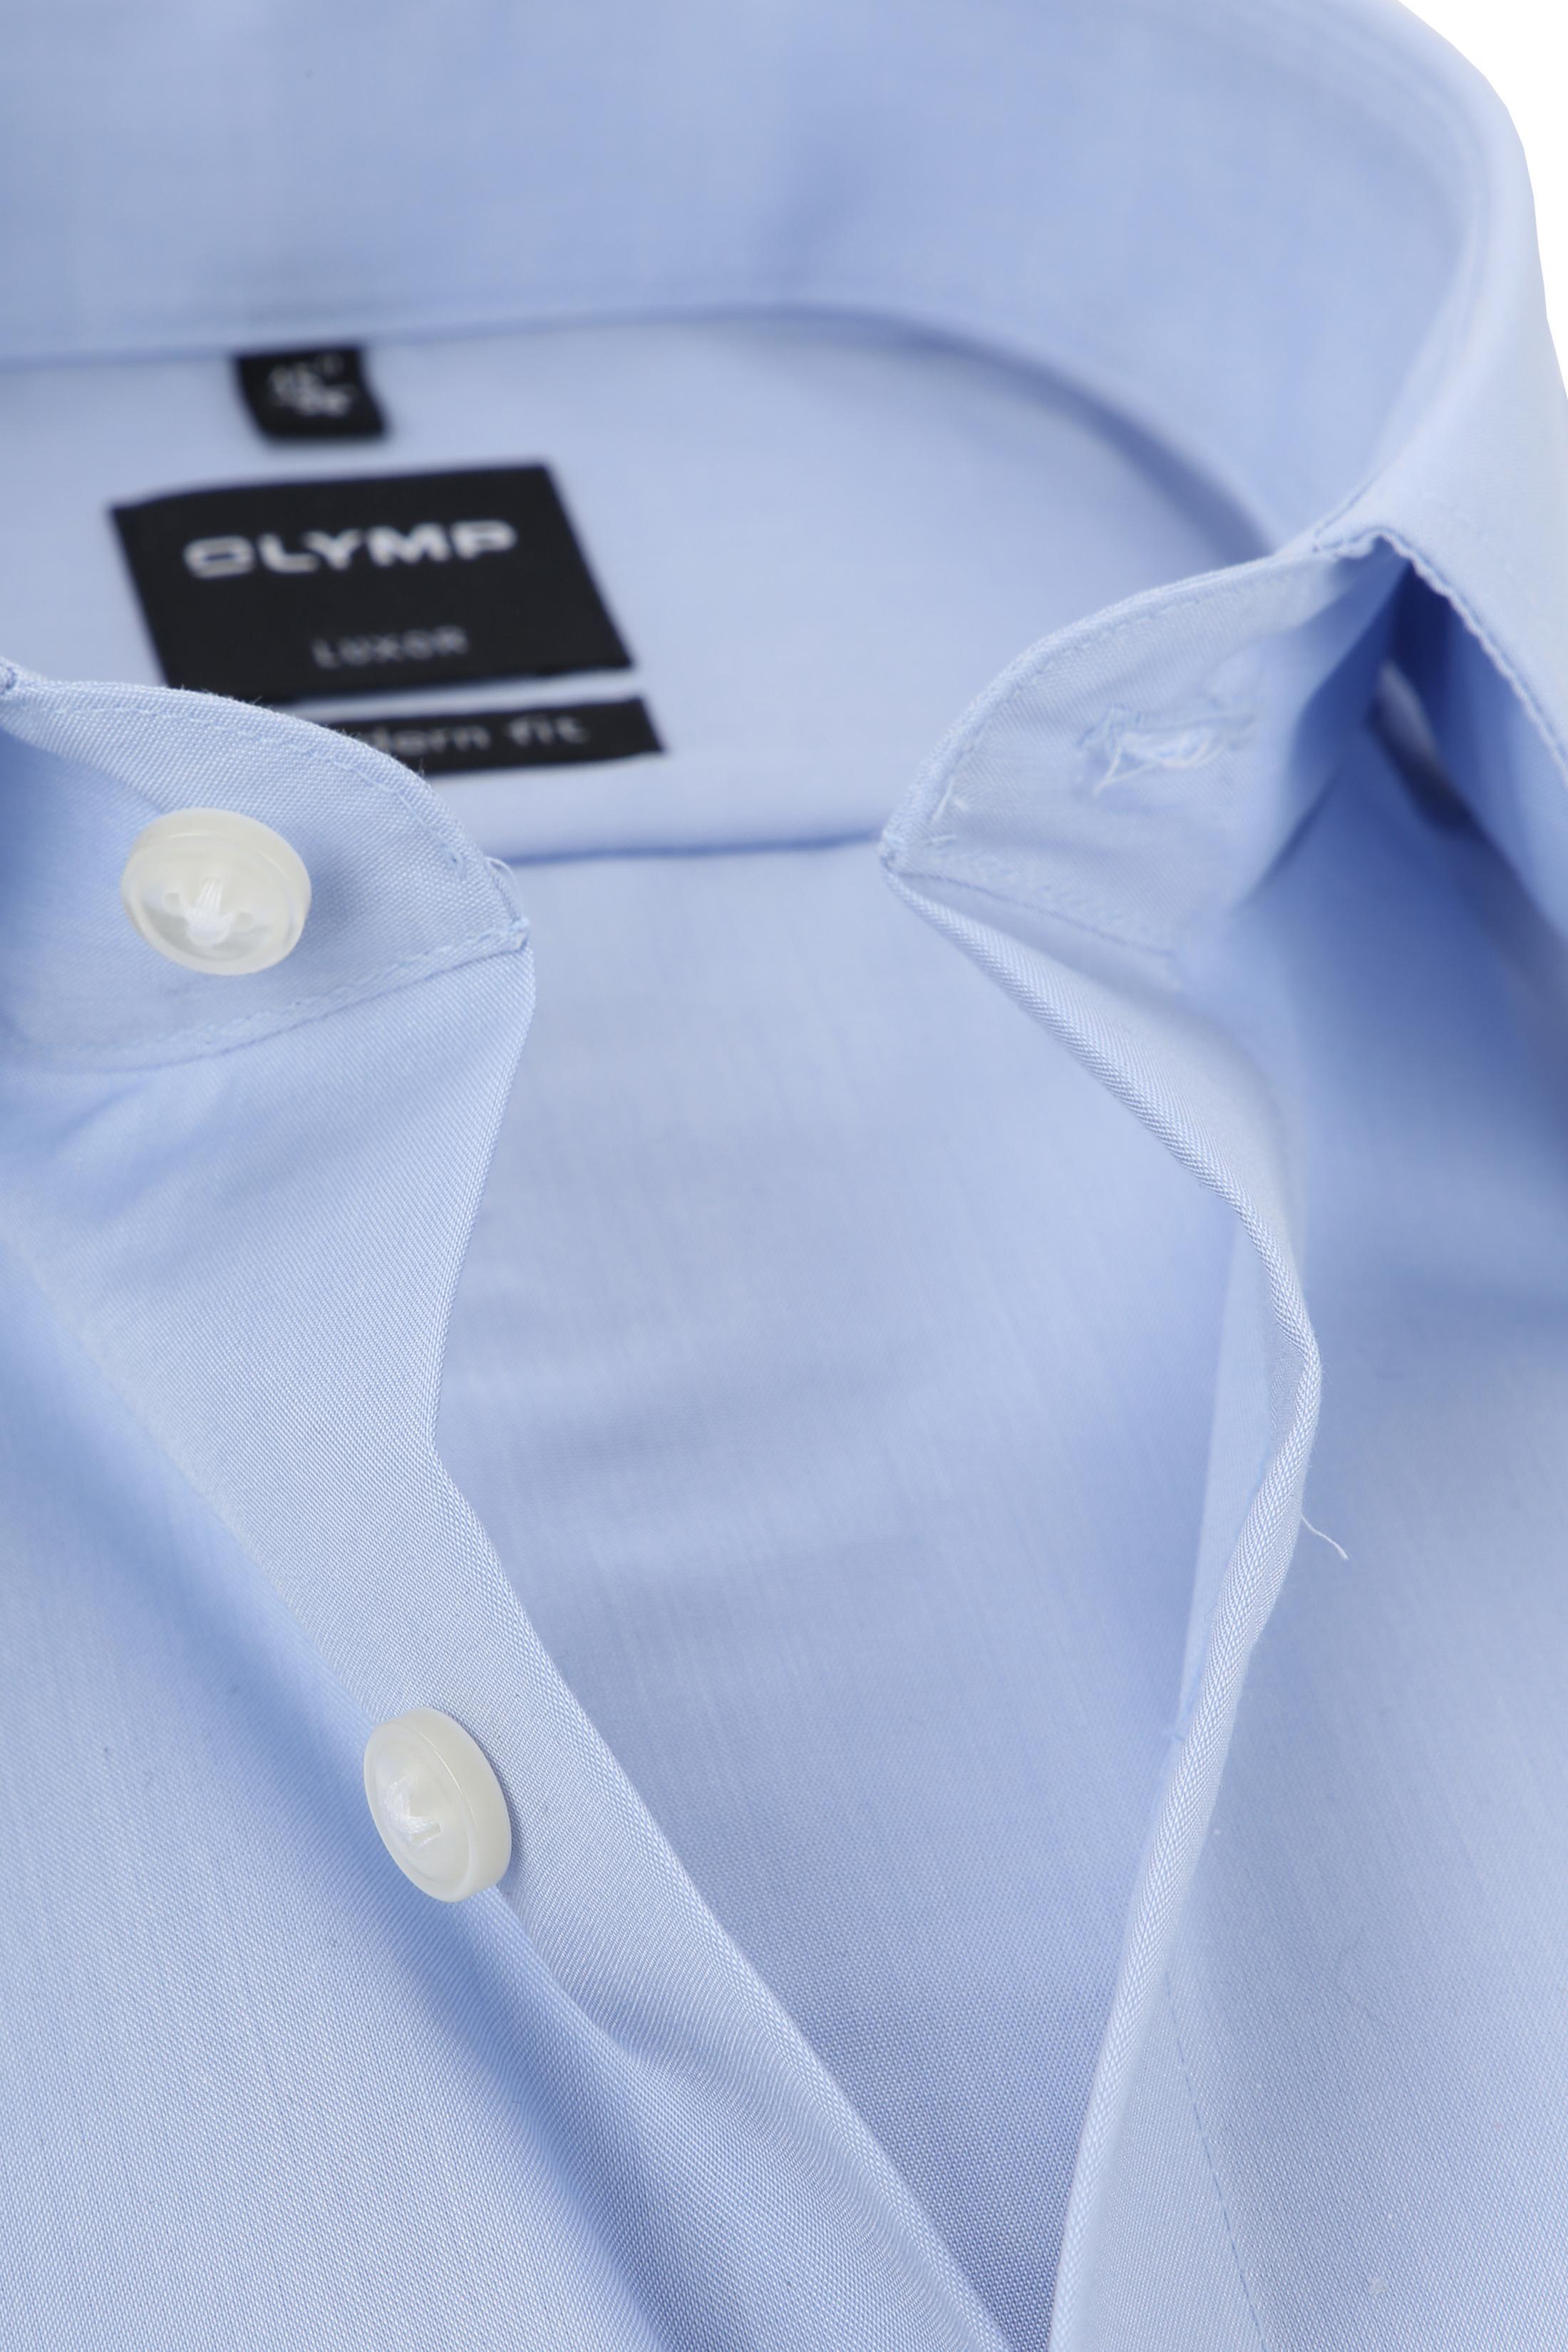 OLYMP Luxor Hemd Modern Fit Doppelmanschette Blau foto 1